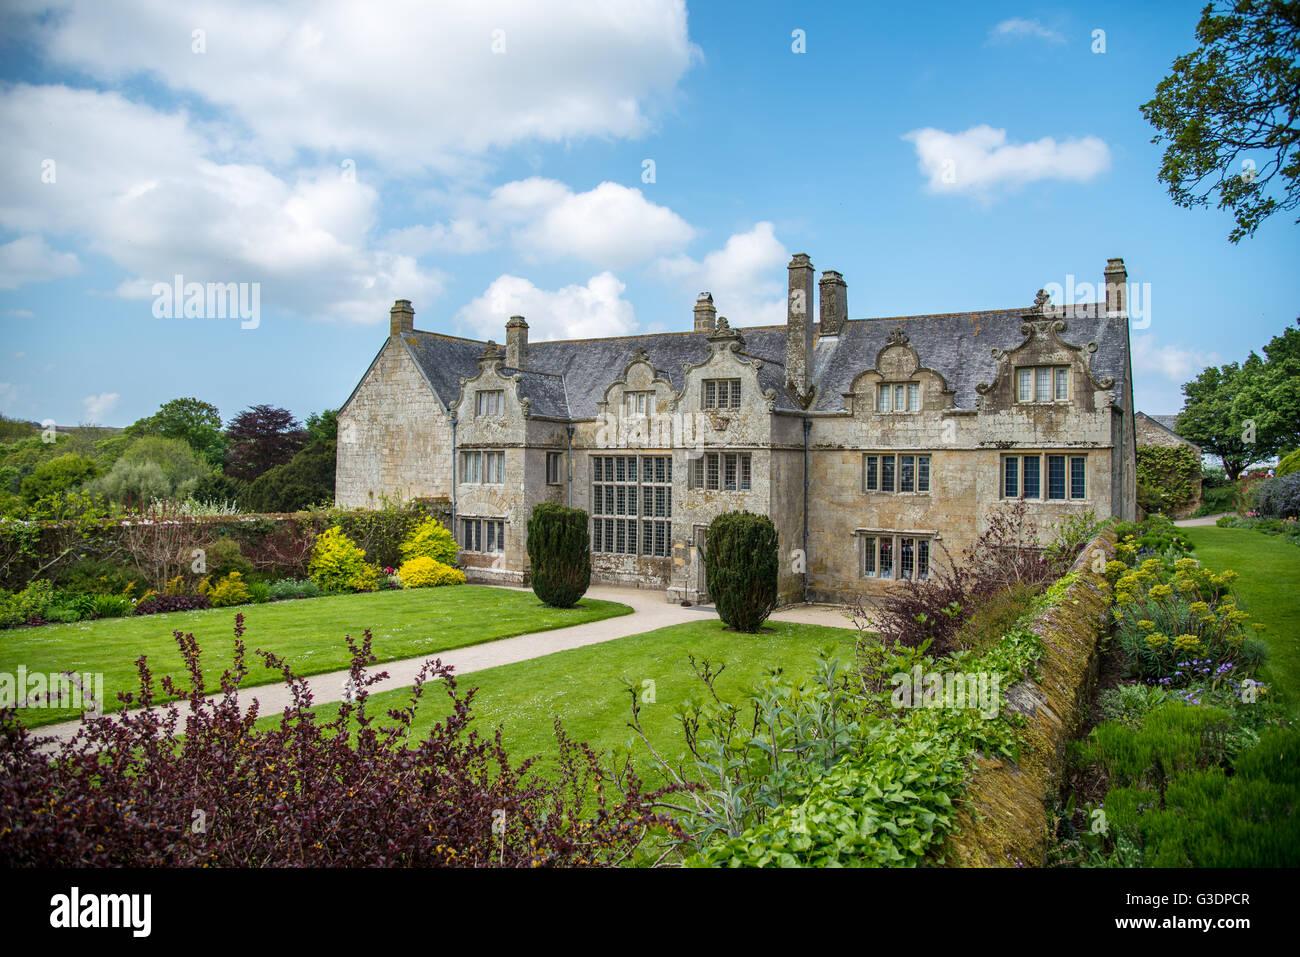 Herrenhaus England Kaufen